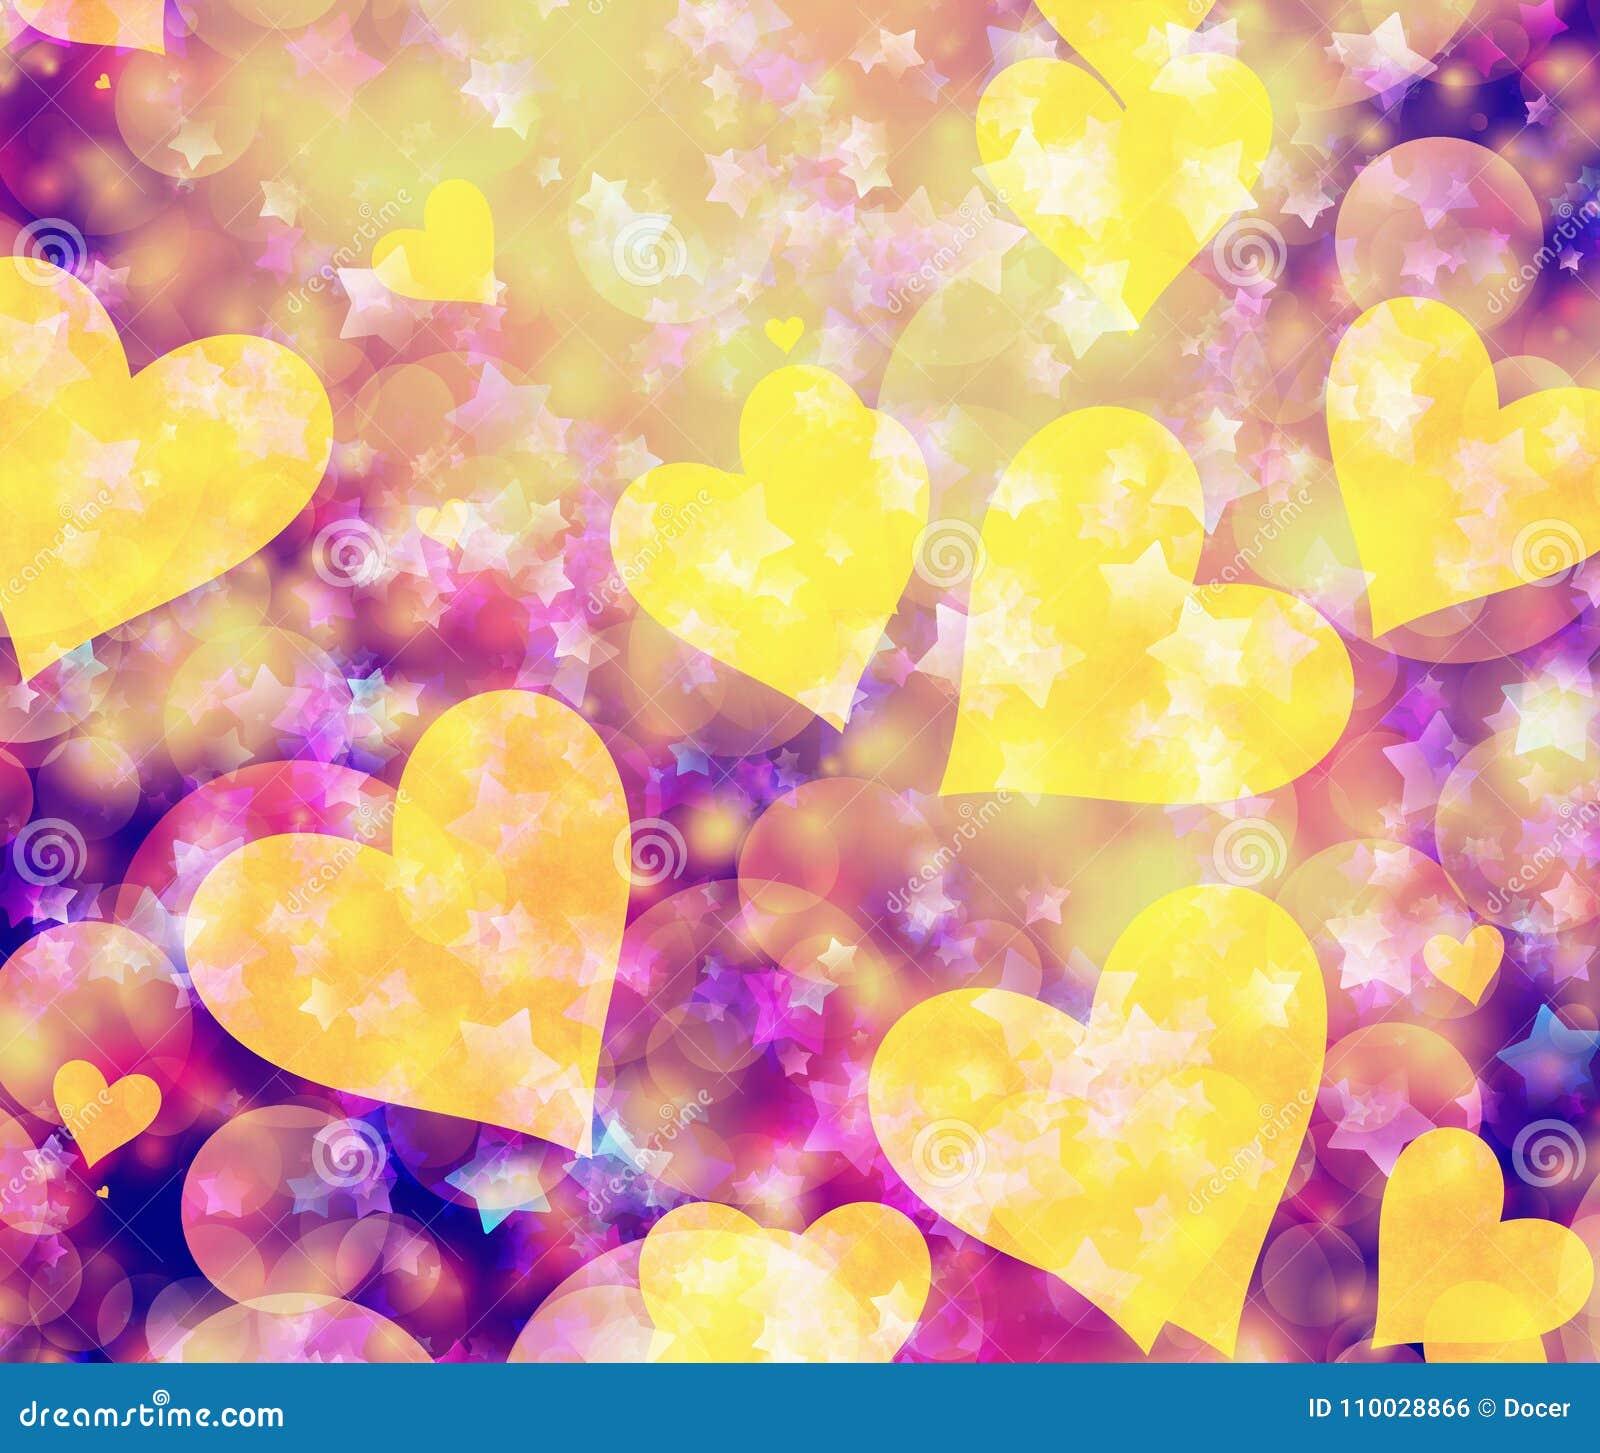 Dromerige lichte harten en sterrenachtergronden